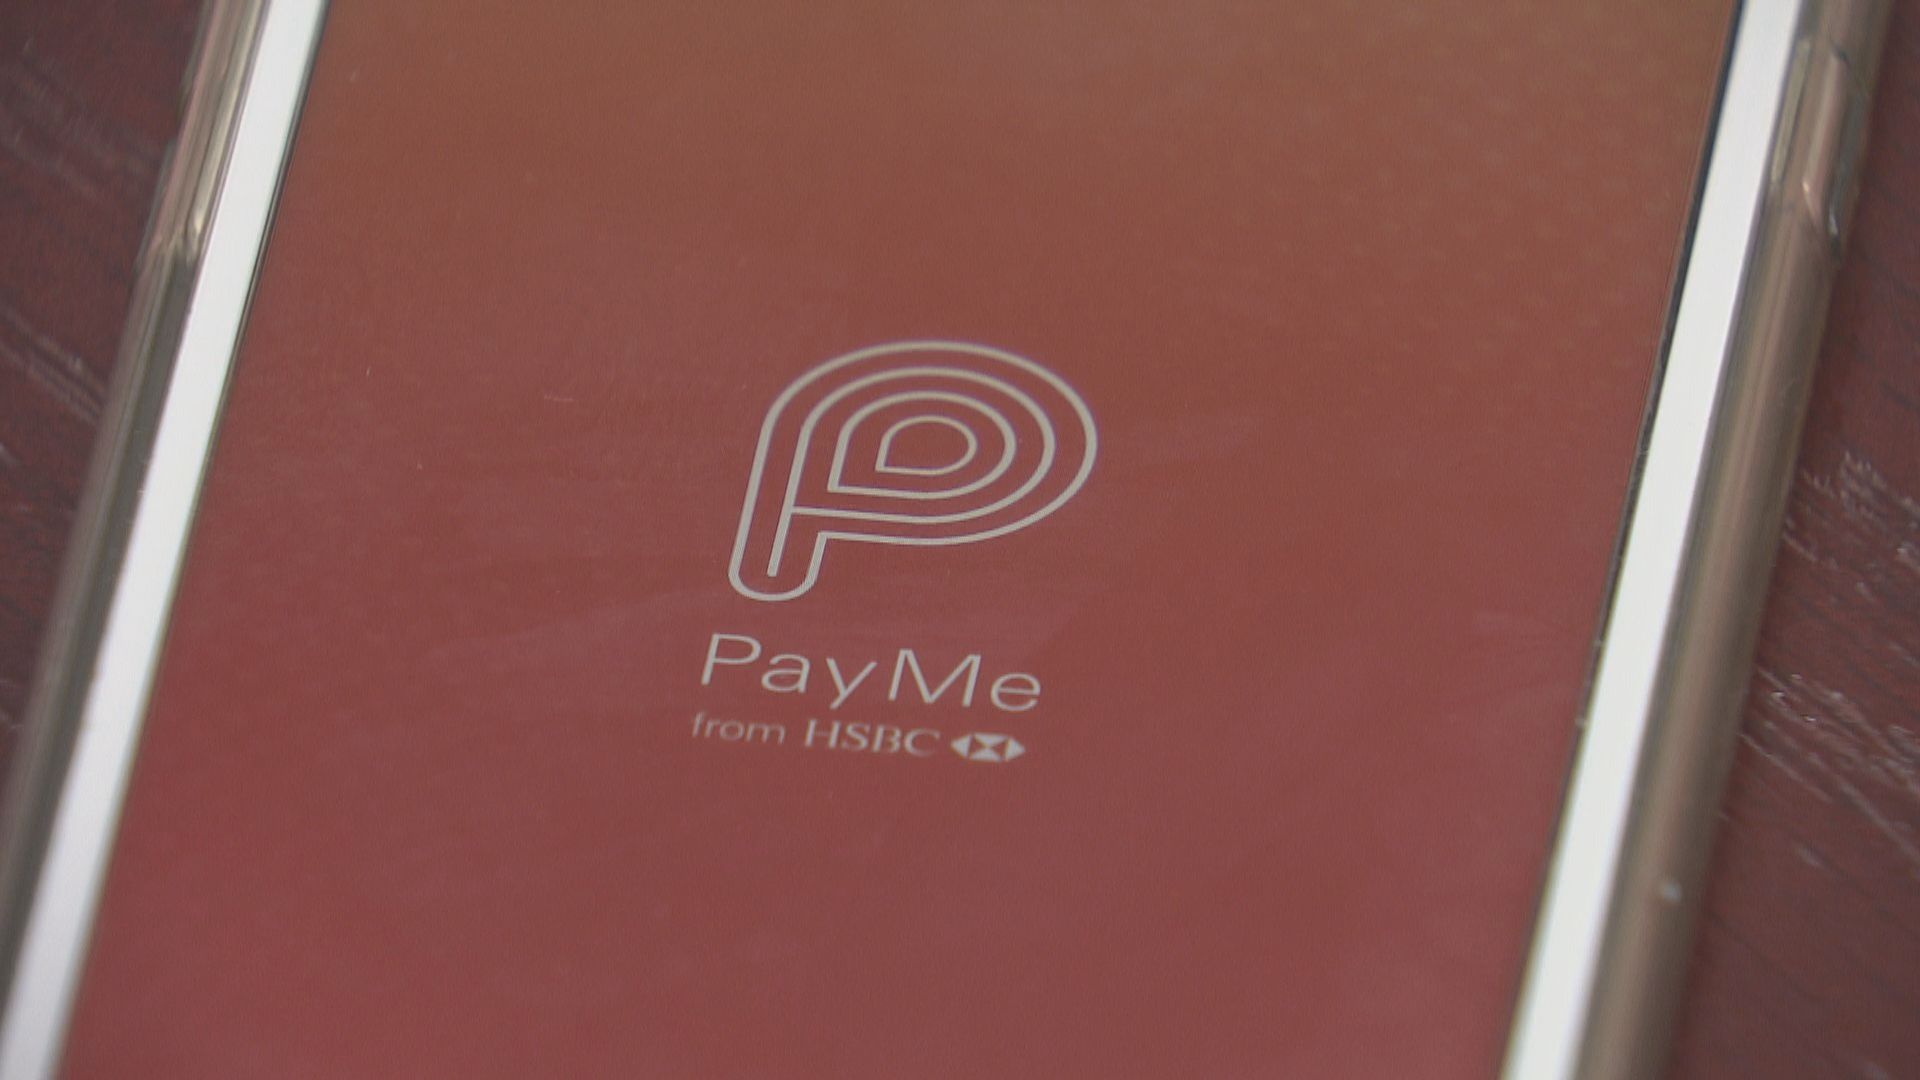 PayMe帳戶被盜款 滙豐暫不准用戶改密碼